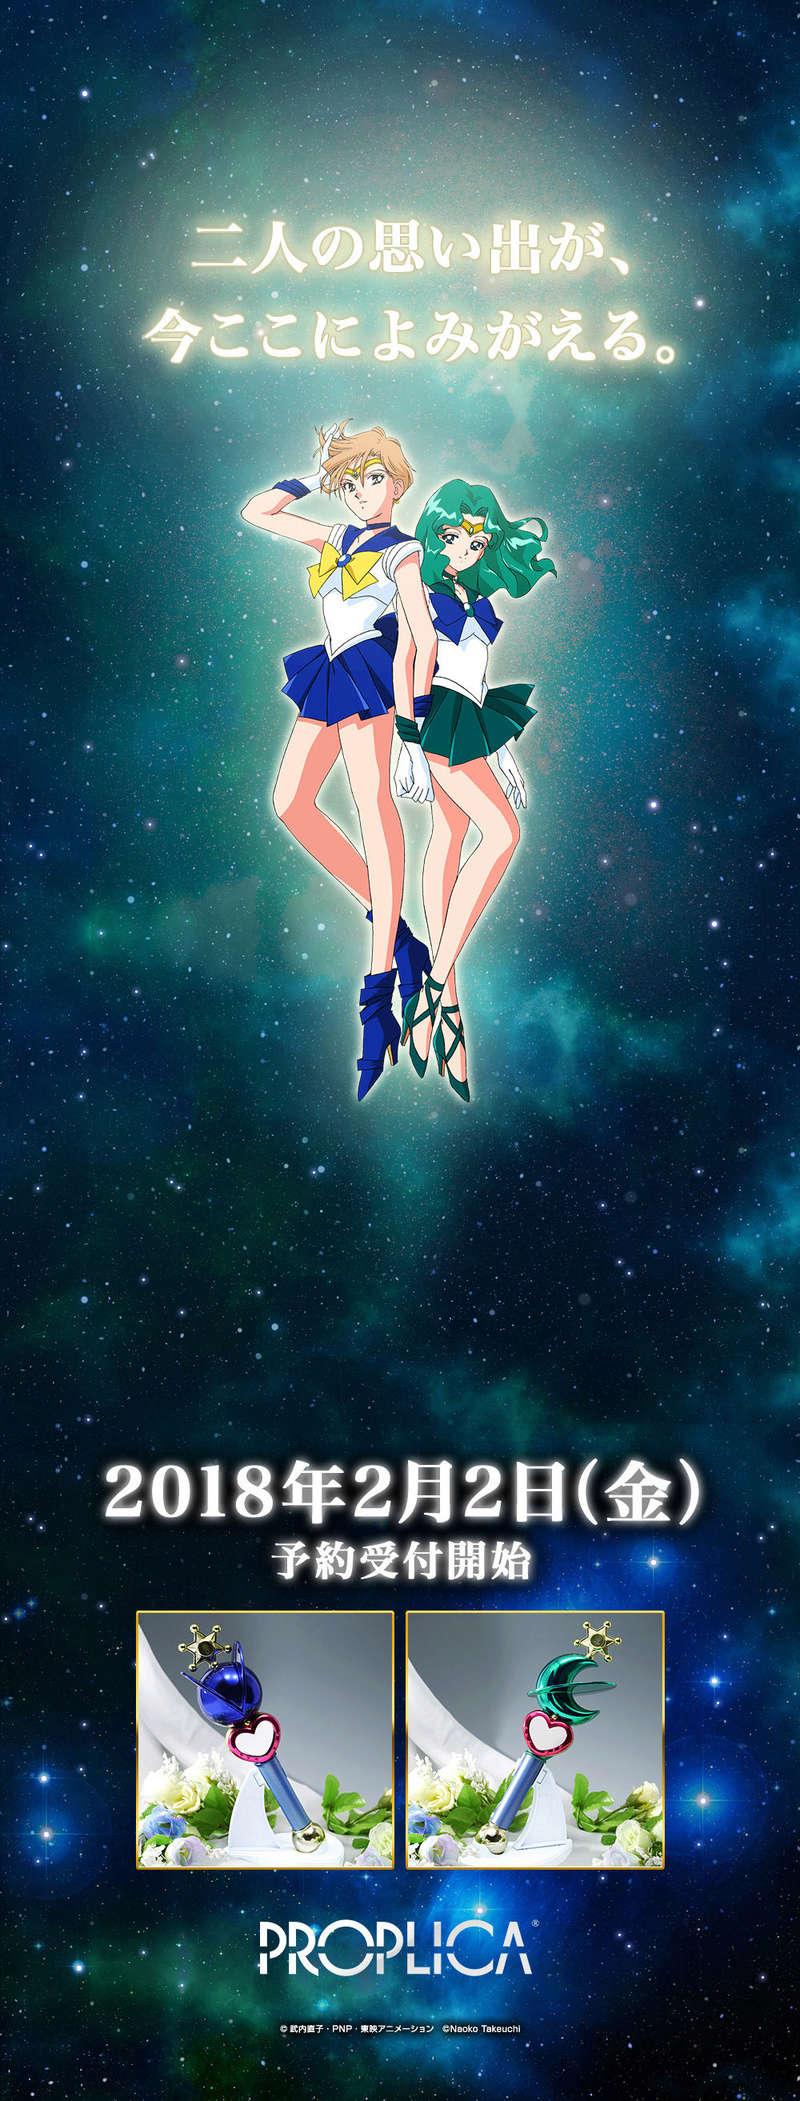 Sailor Moon - Proplica (Bandai) 876011